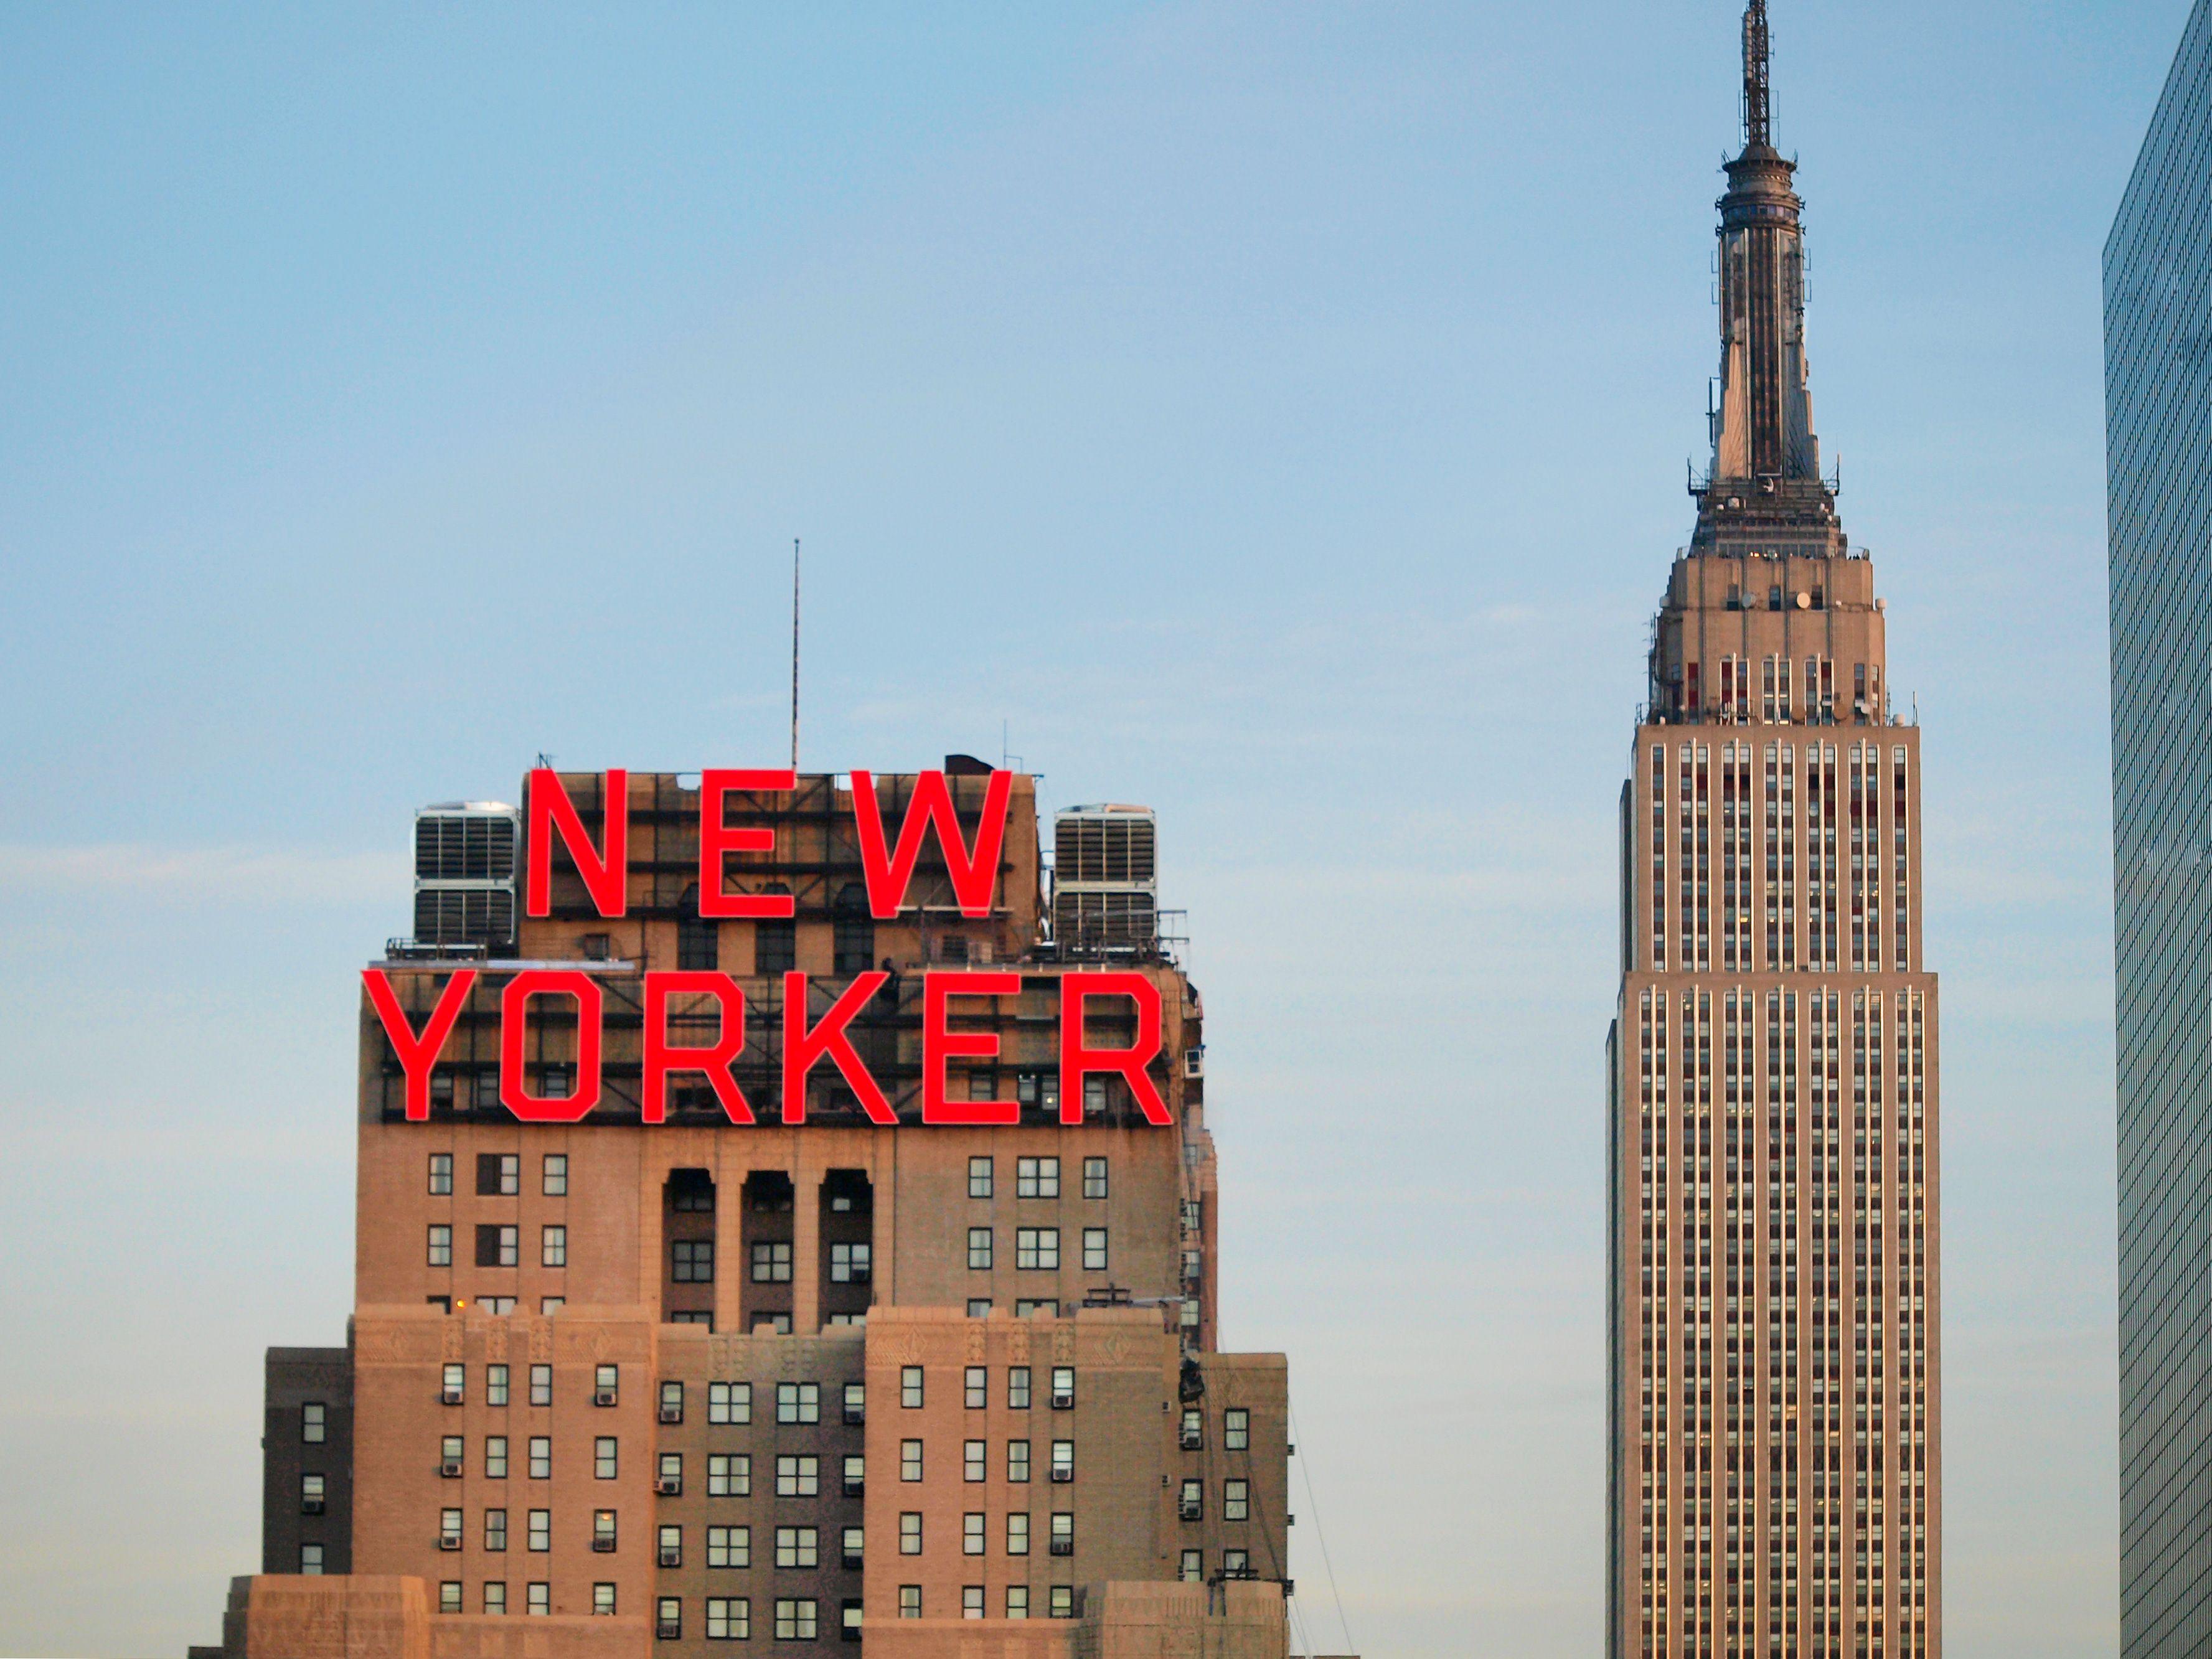 The New Yorker A Wyndham Hotel 106 4 7 7 Updated 2020 Prices Reviews New York City Tripadvisor New York City New York Travel Trip Advisor